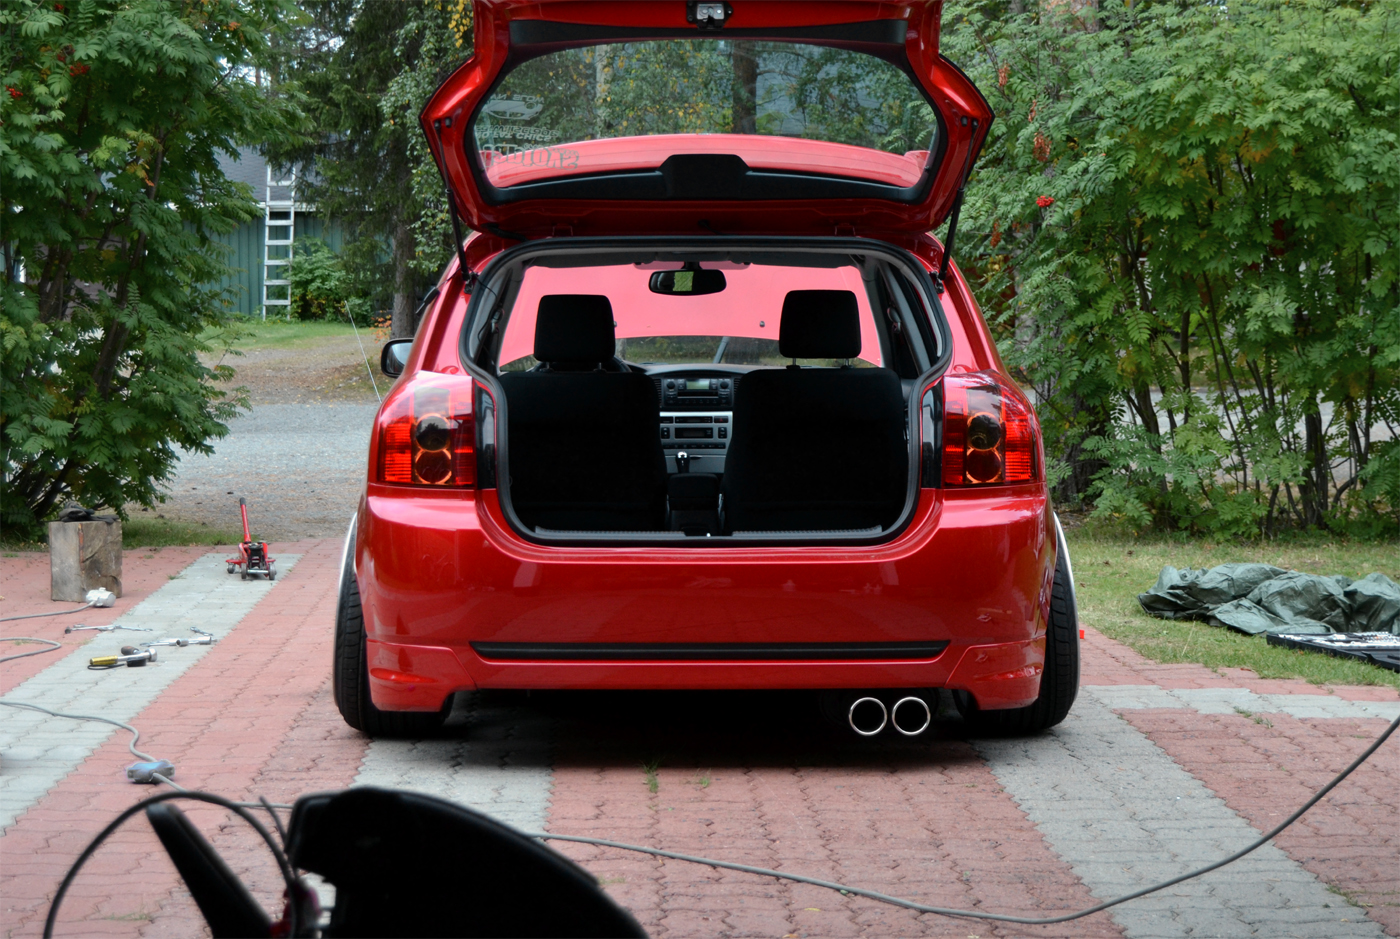 Japtoys & Fittest presents: Mysticin Toyota Corolla E12 Pxm2